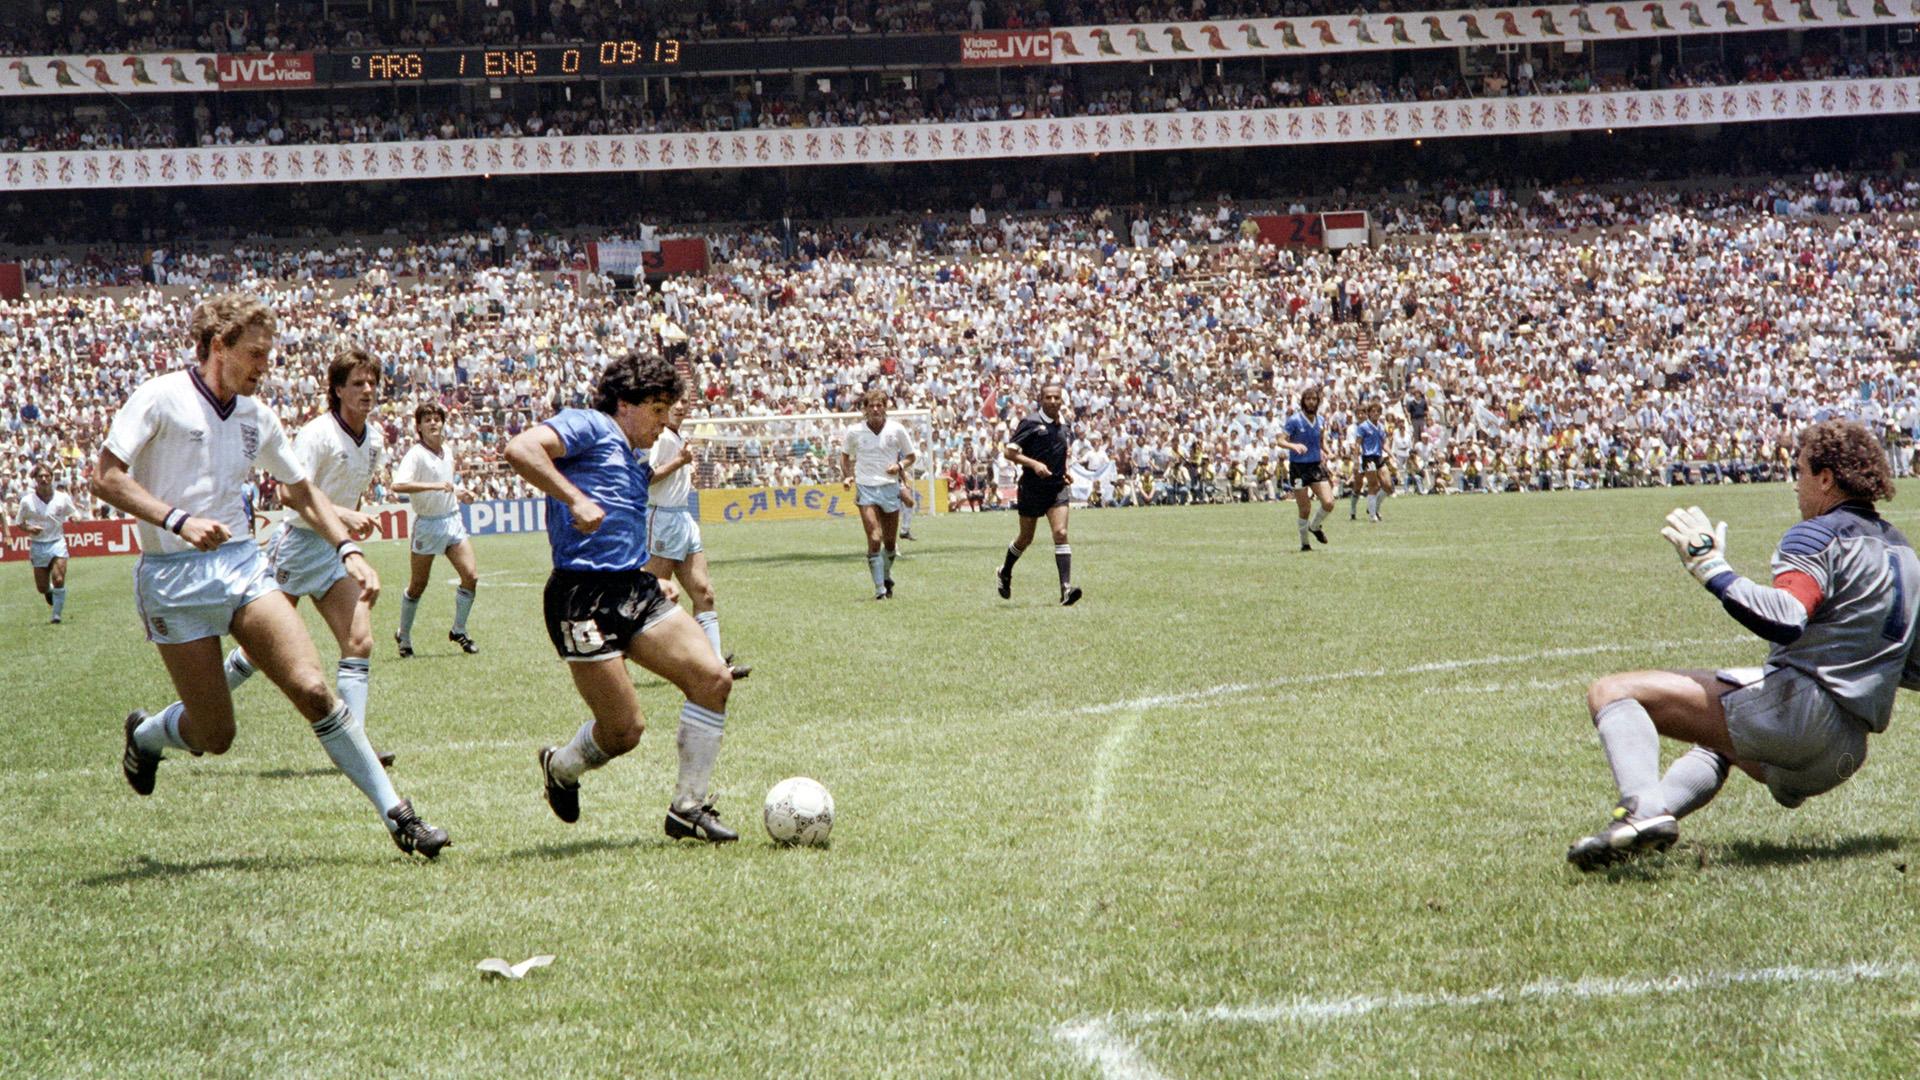 England Argentina World Cup 1986